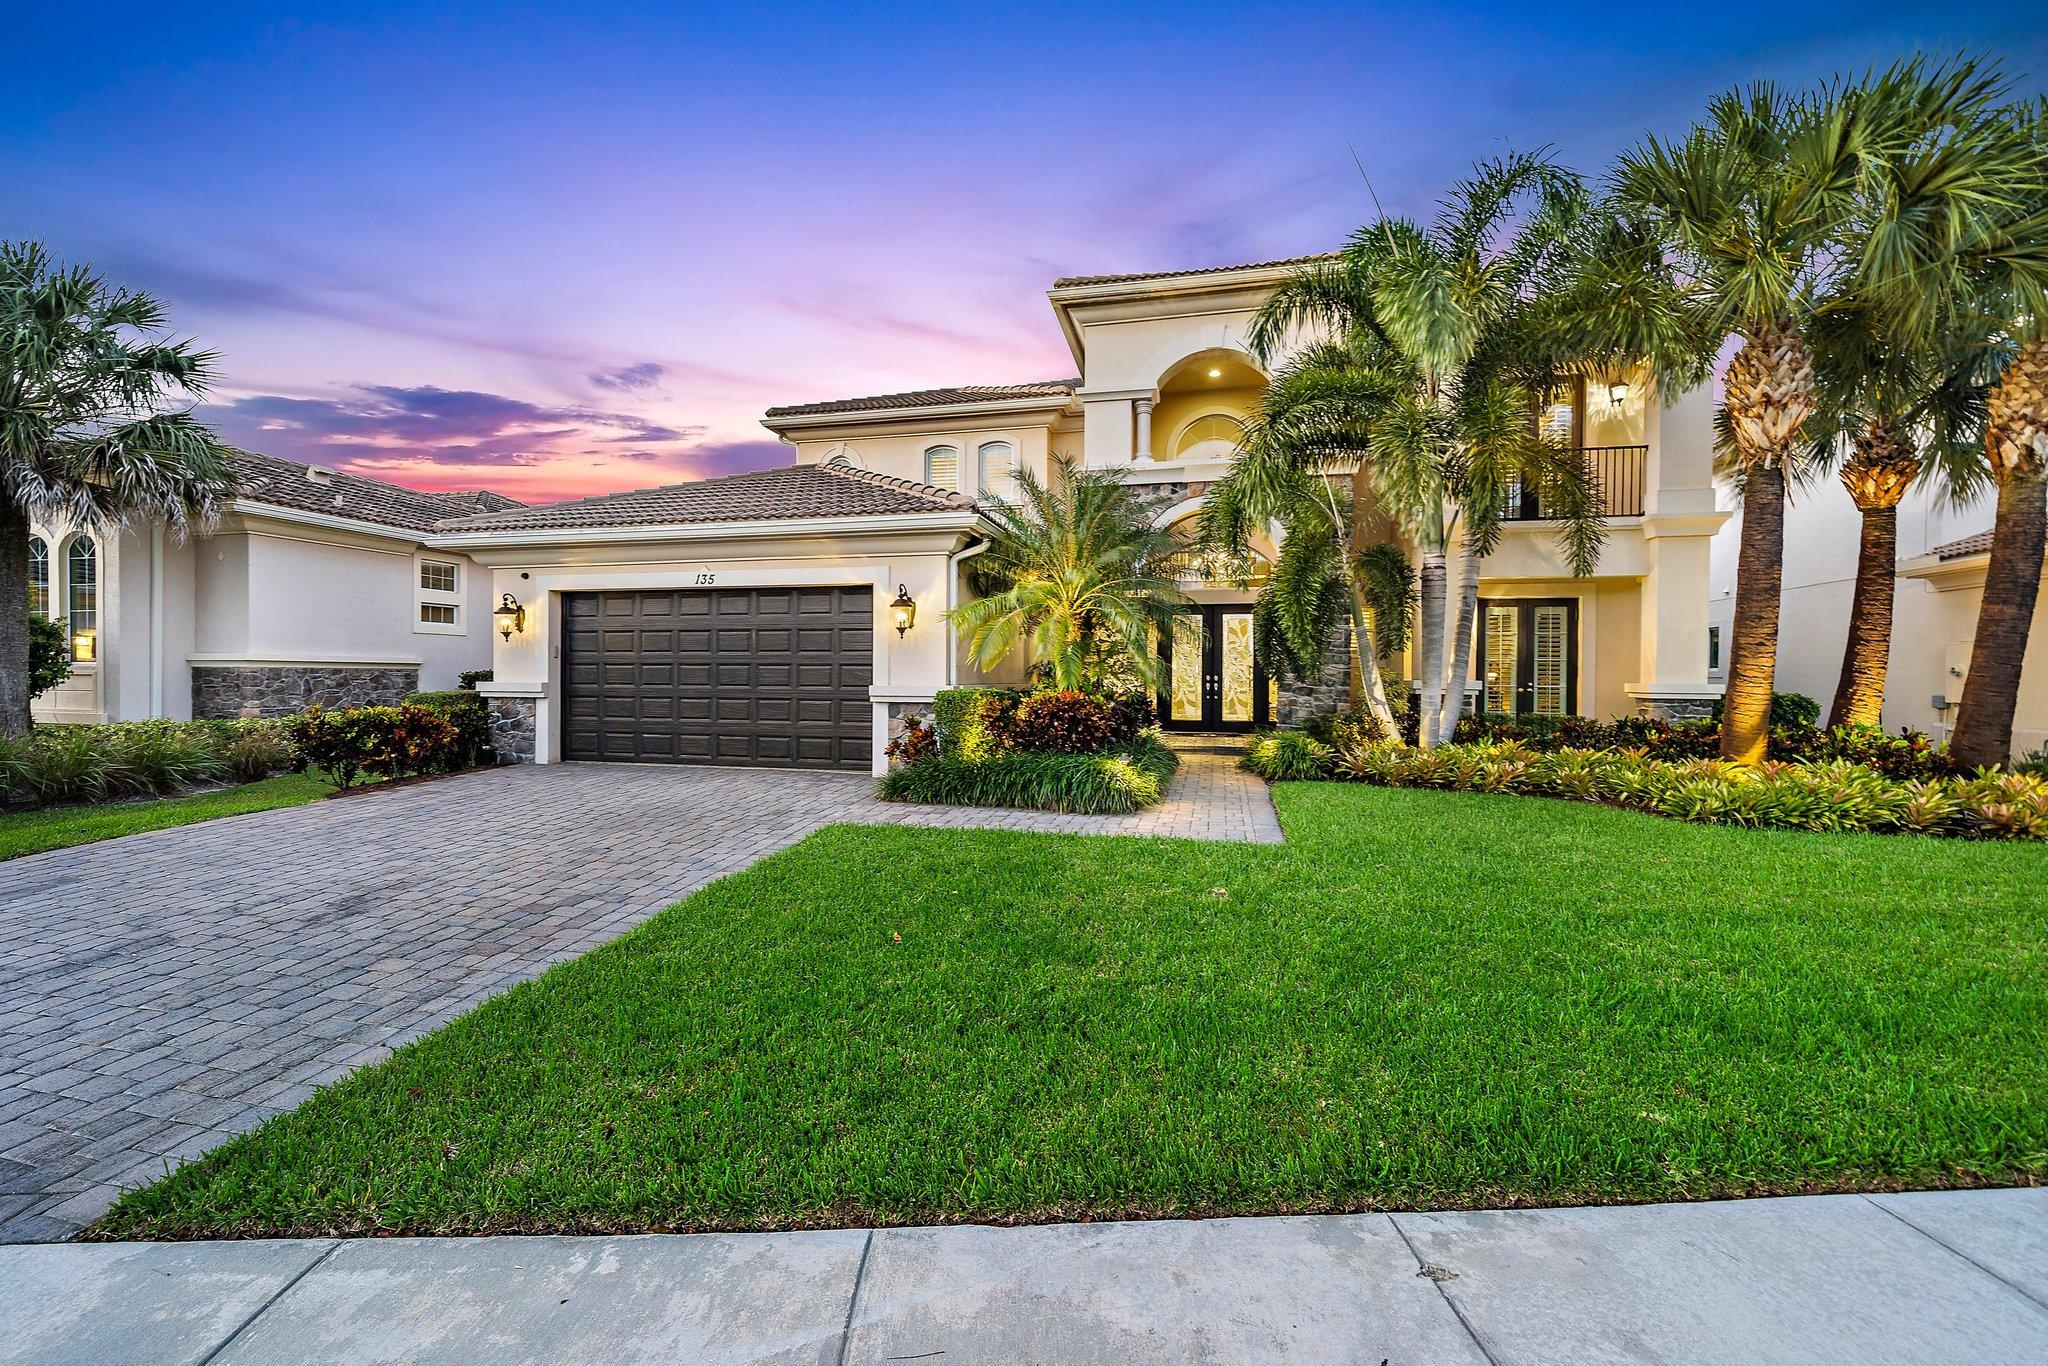 135 Carmela Court, Jupiter, Florida 33478, 5 Bedrooms Bedrooms, ,5 BathroomsBathrooms,A,Single family,Carmela,RX-10682709